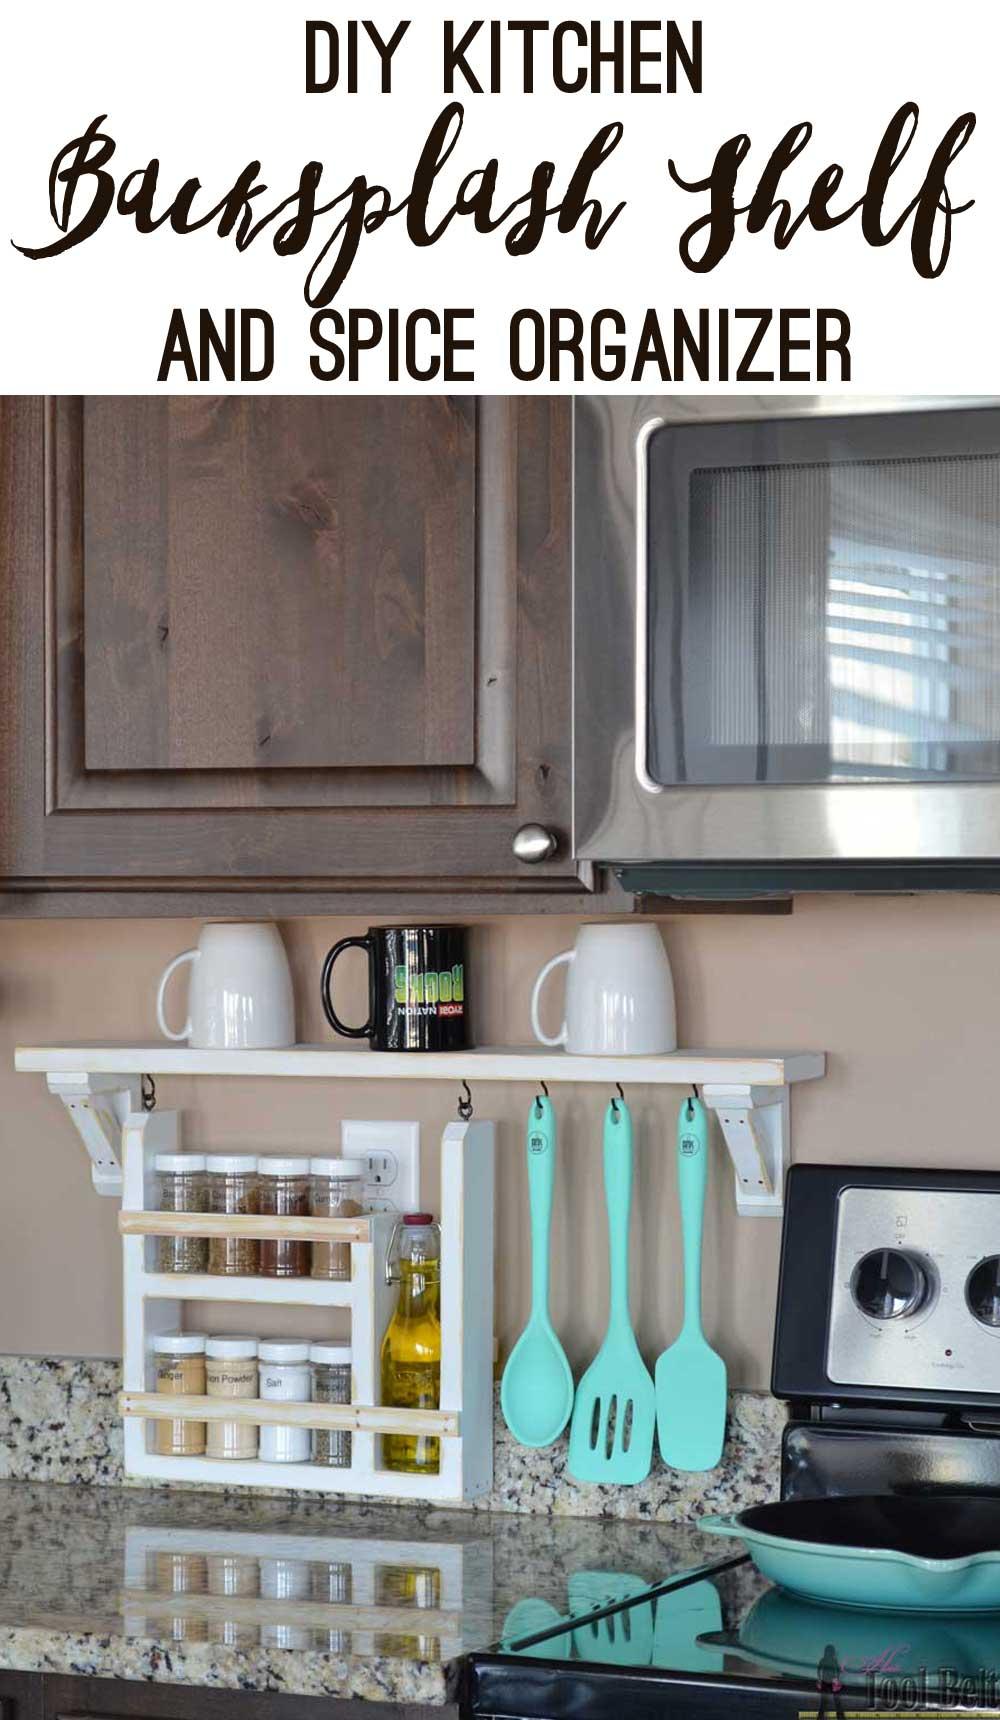 Neat and Organized Backsplash Shelf